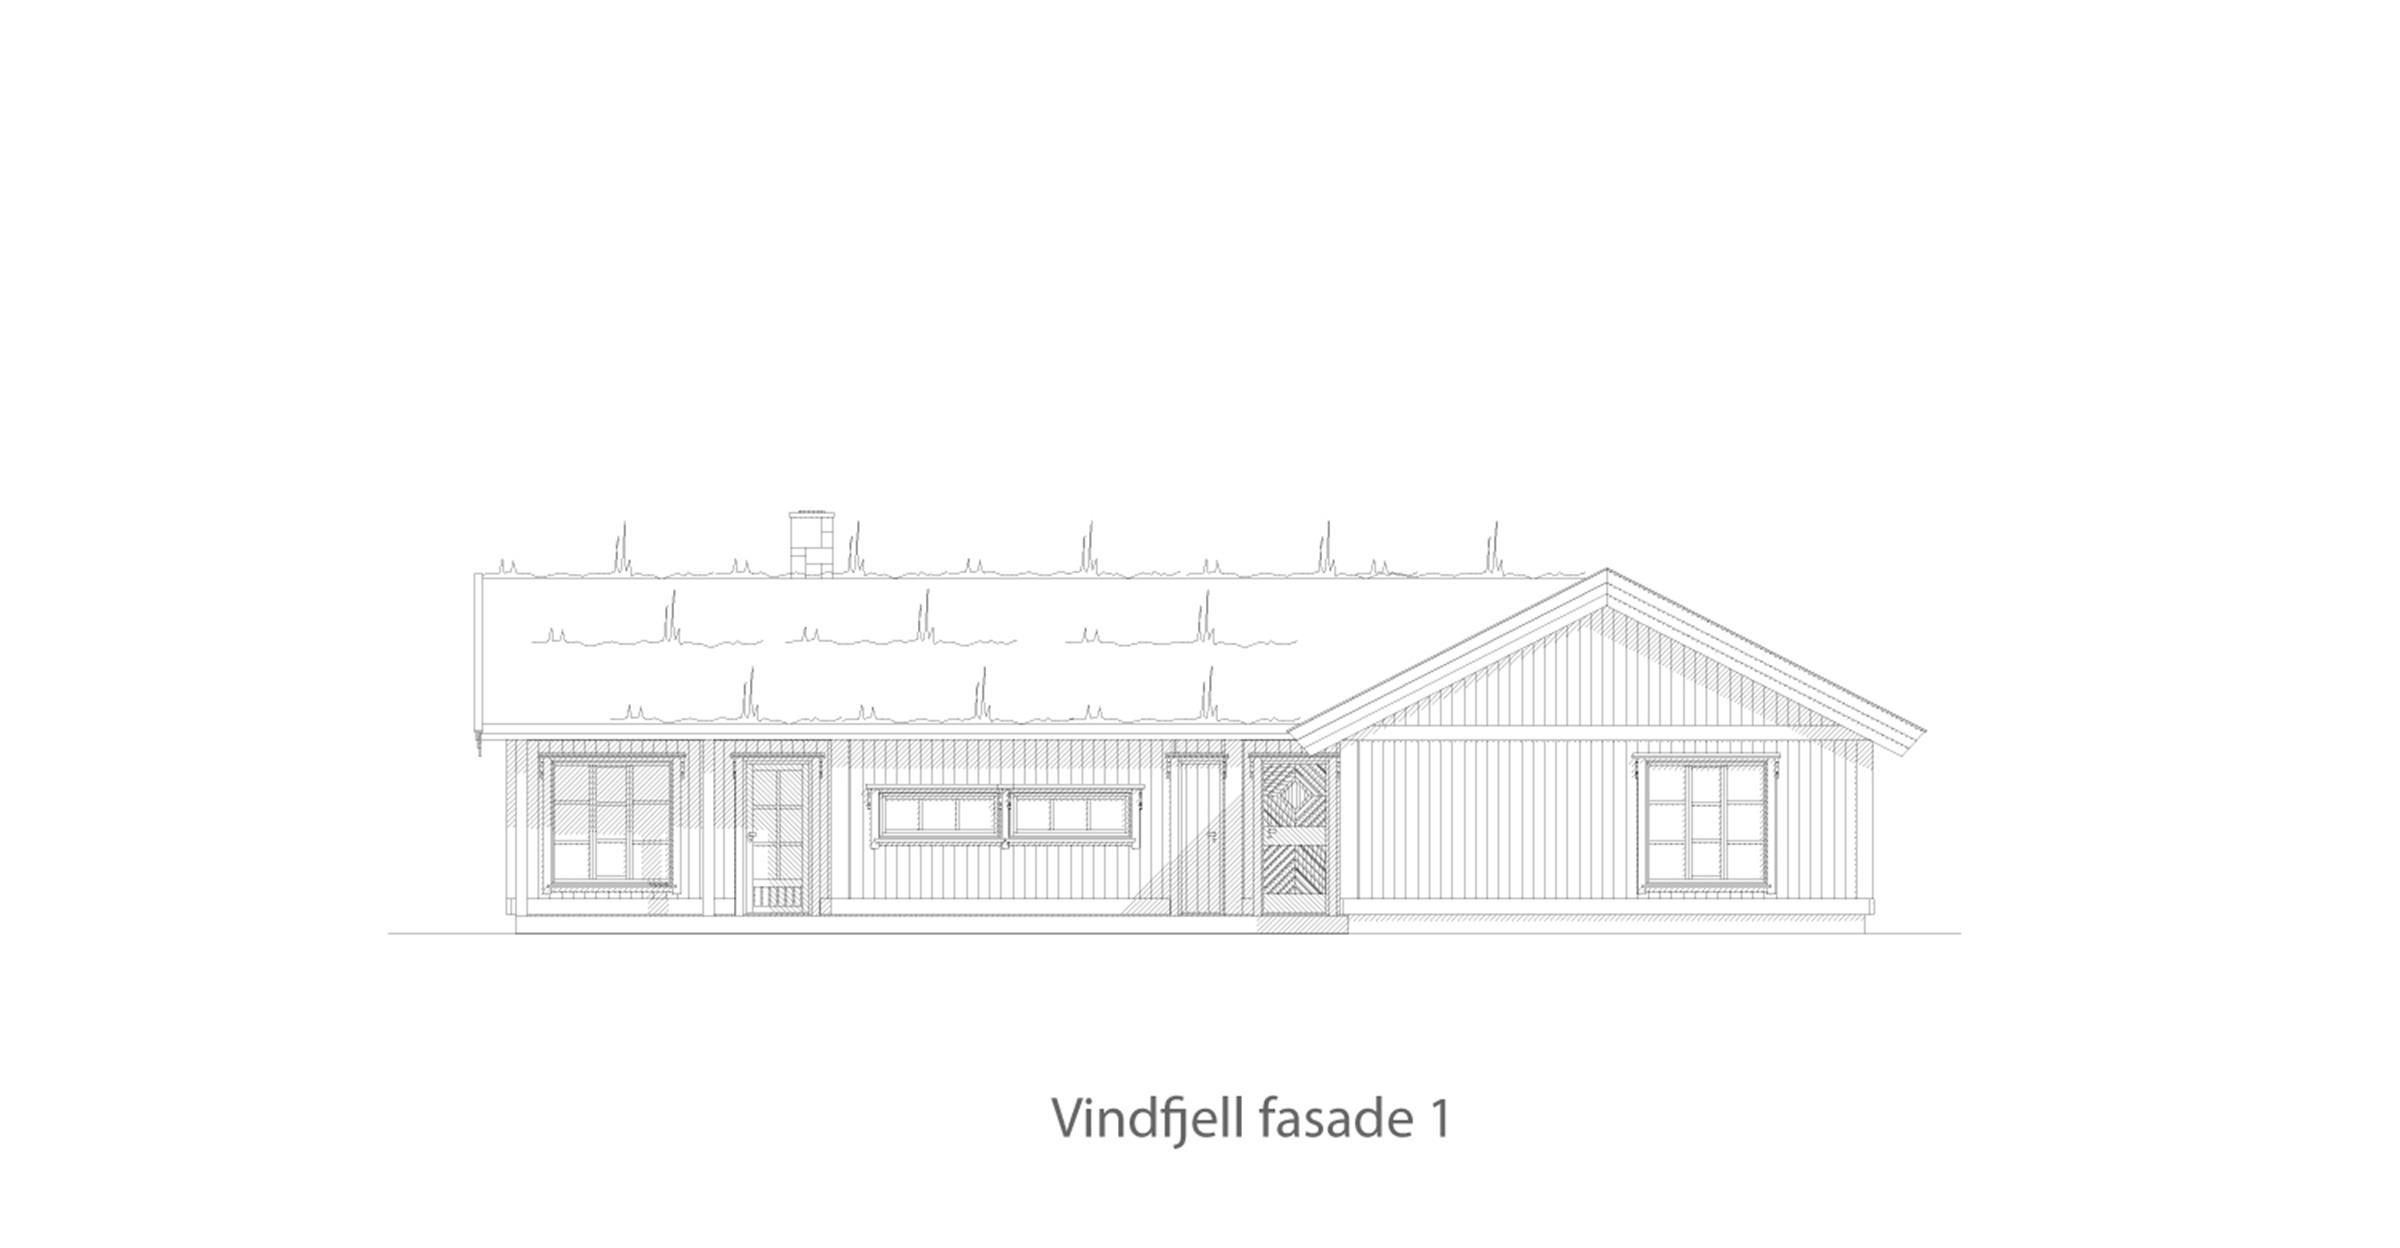 Vindfjell fasade 1